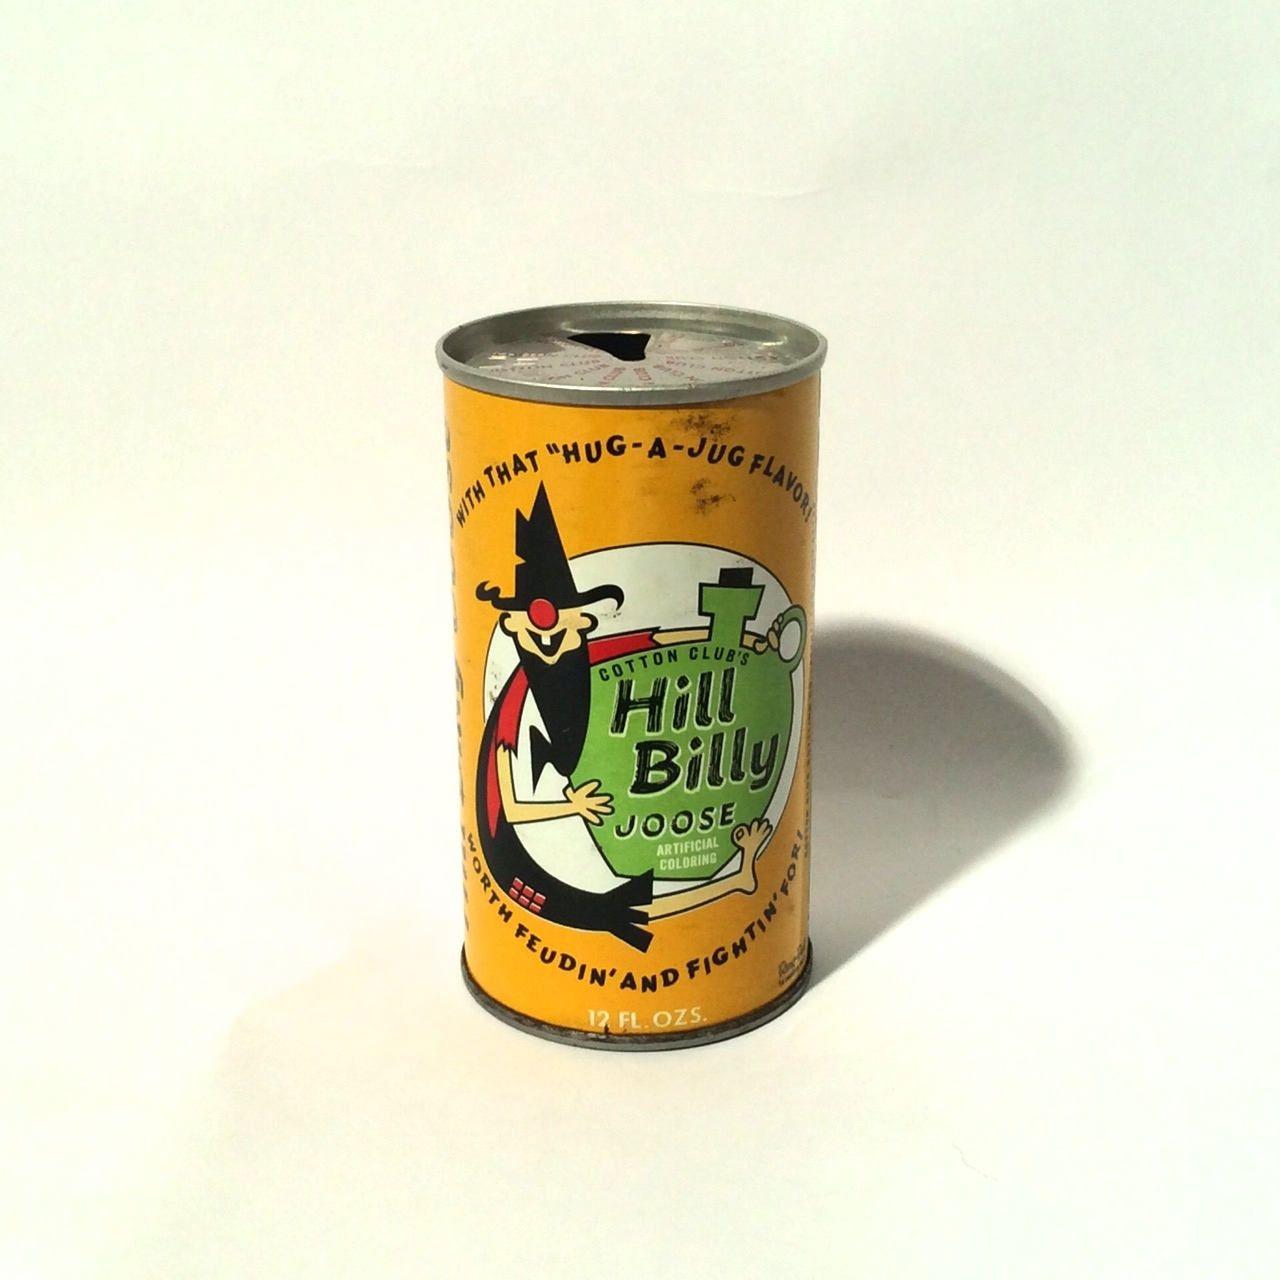 Vintage 1960s Hillbilly Joose Novelty Collectible Steel Pop Soda Can Pop Tab Canning Vintage Novelty